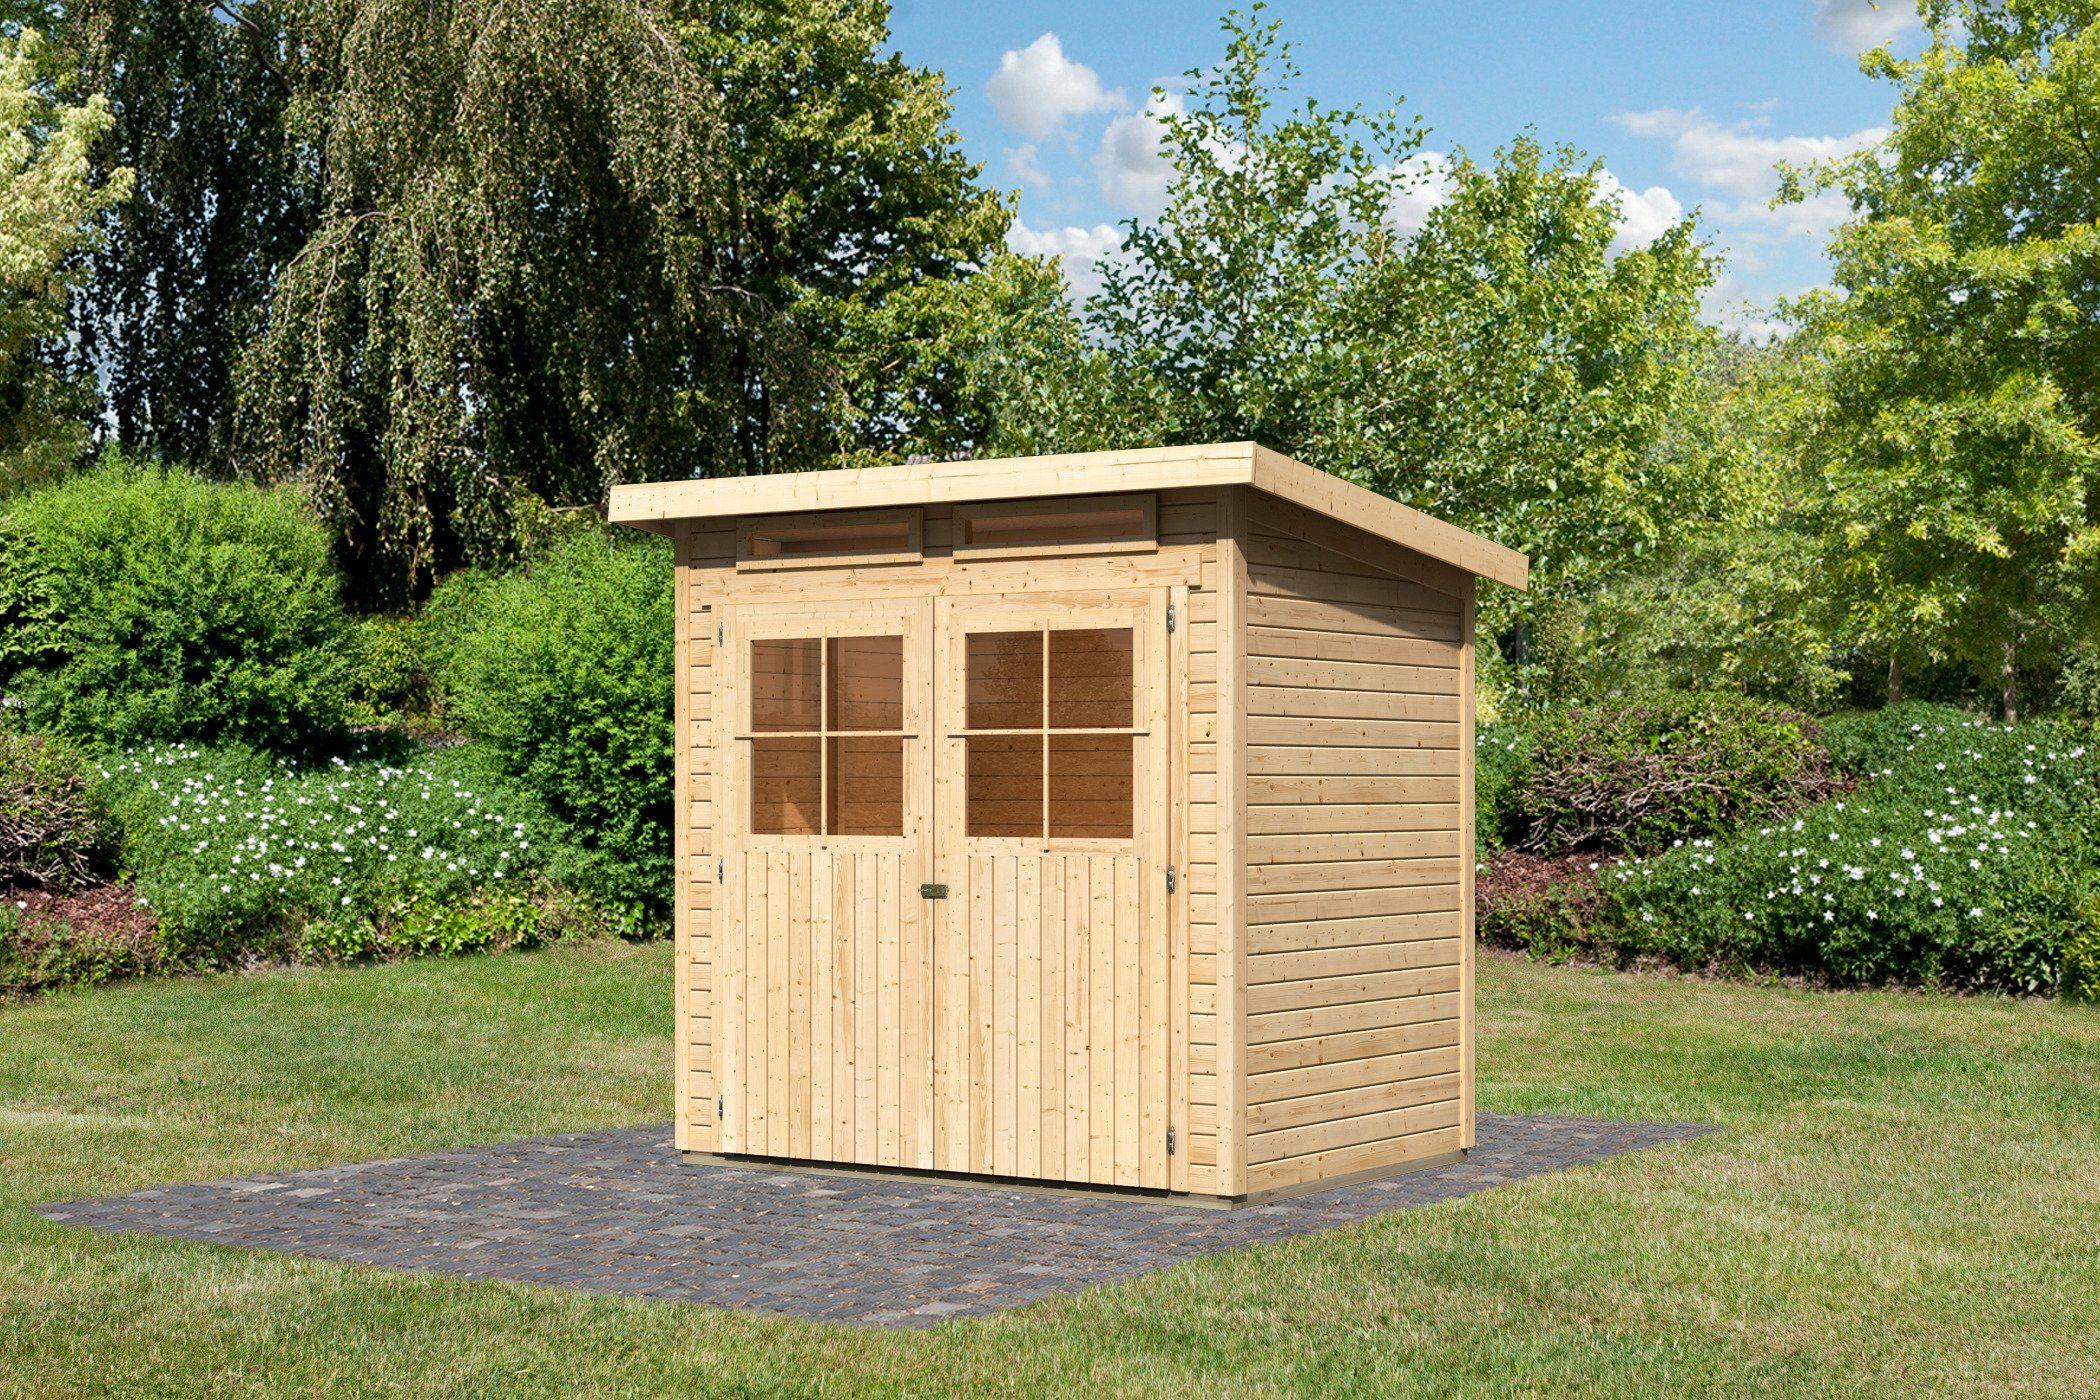 gartenhaus 2m x 3m ar35 hitoiro. Black Bedroom Furniture Sets. Home Design Ideas